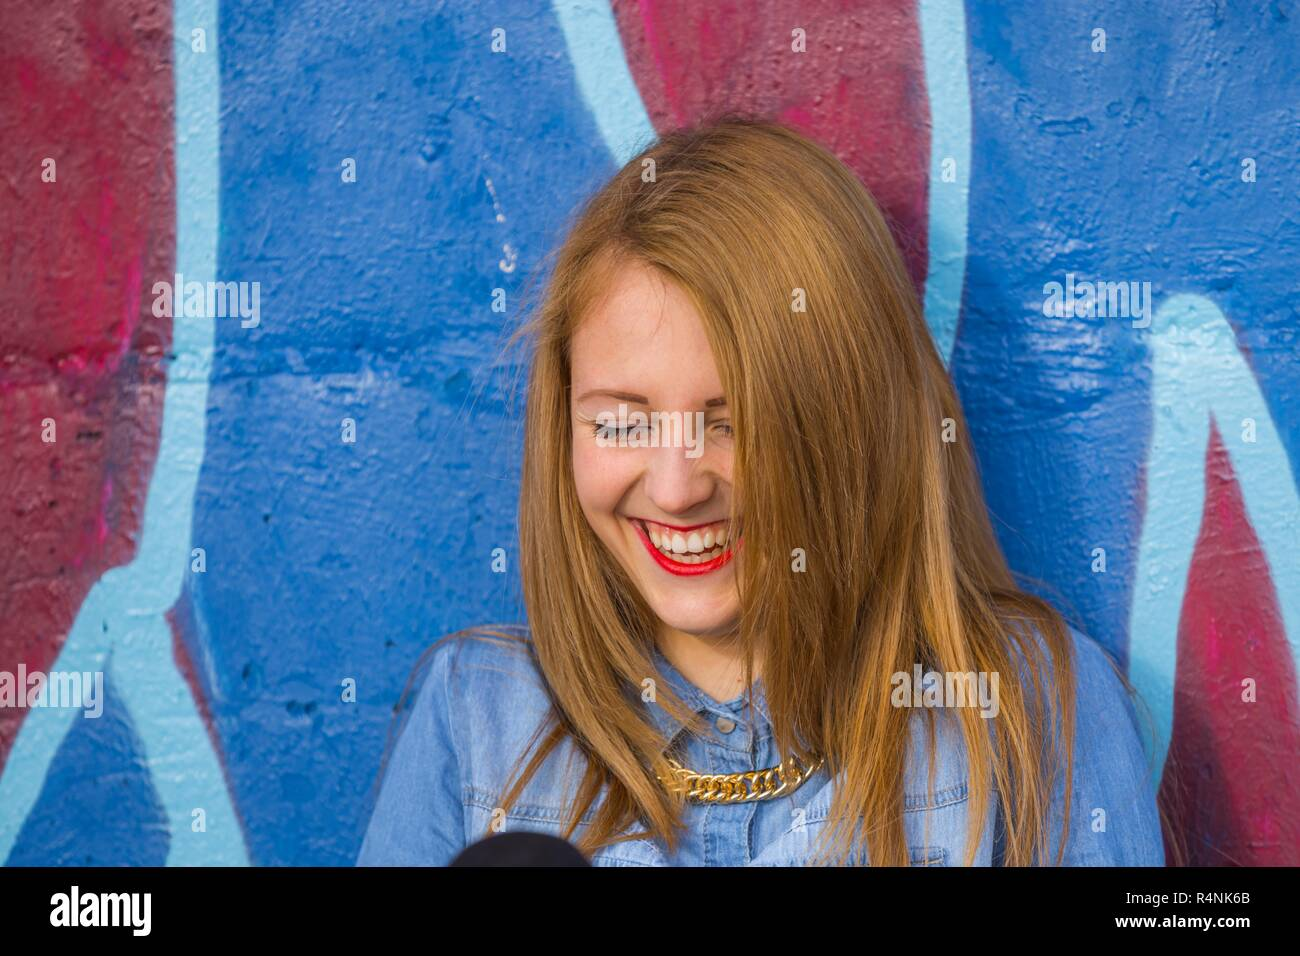 Lachen expressive positive herrliche Freude Ausdruck alpfabet womans Frauen Modell - freigegebene Release Stockbild